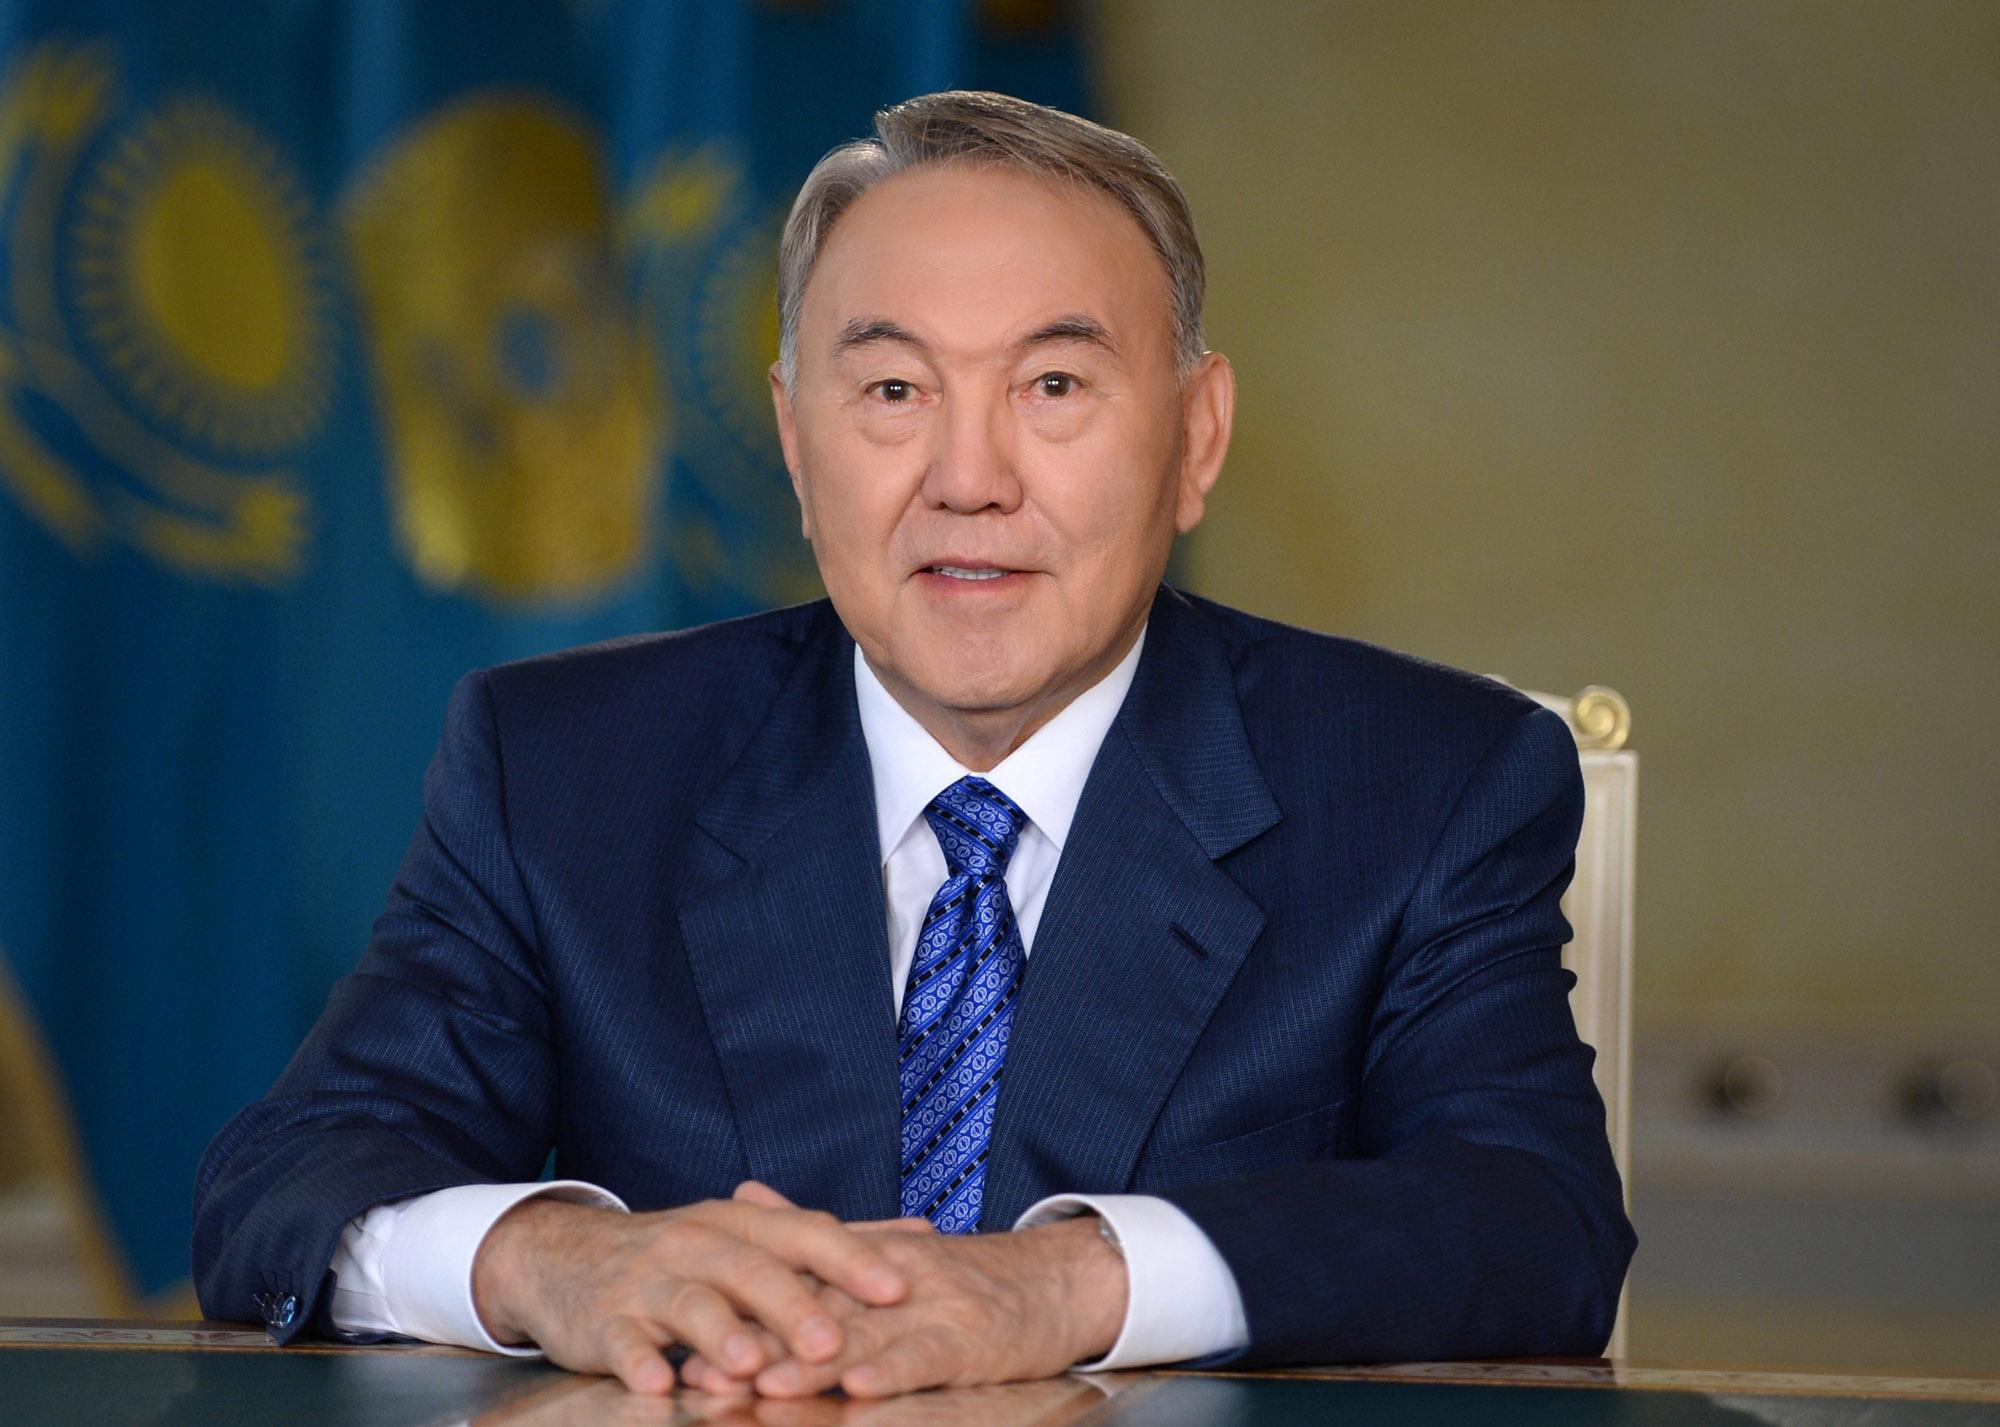 His Excellency Mr. Sooronbai Jeenbekov, President-elect of the Kyrgyz Republic